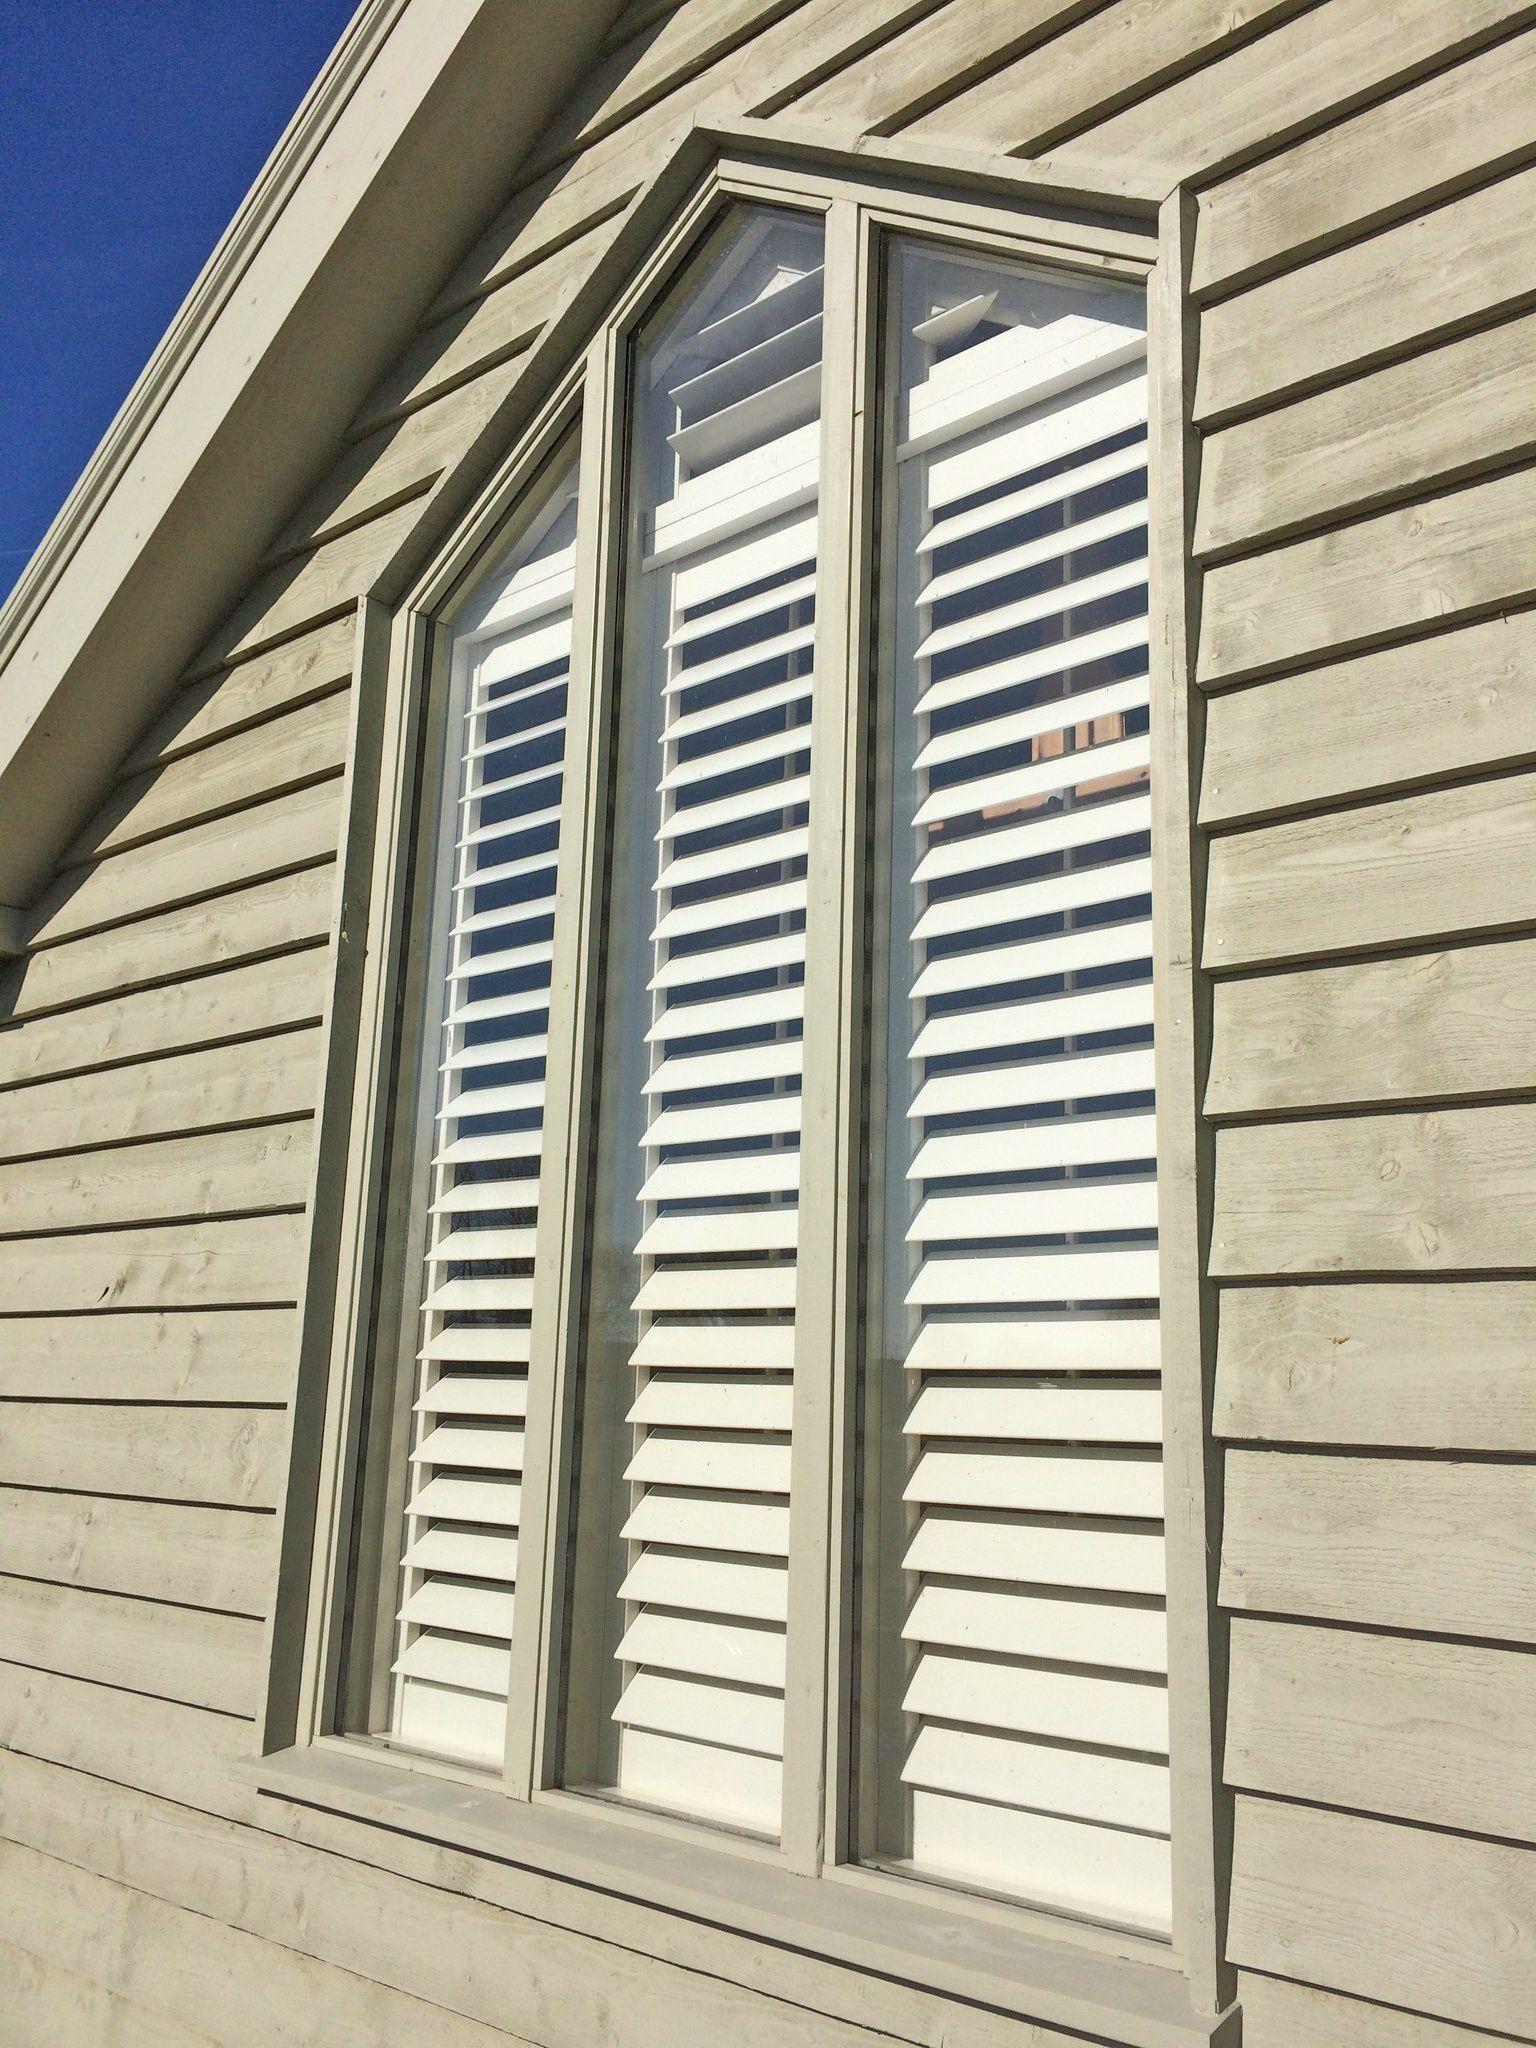 Gable end window ideas  special shape shutters for gable end window in suffolk